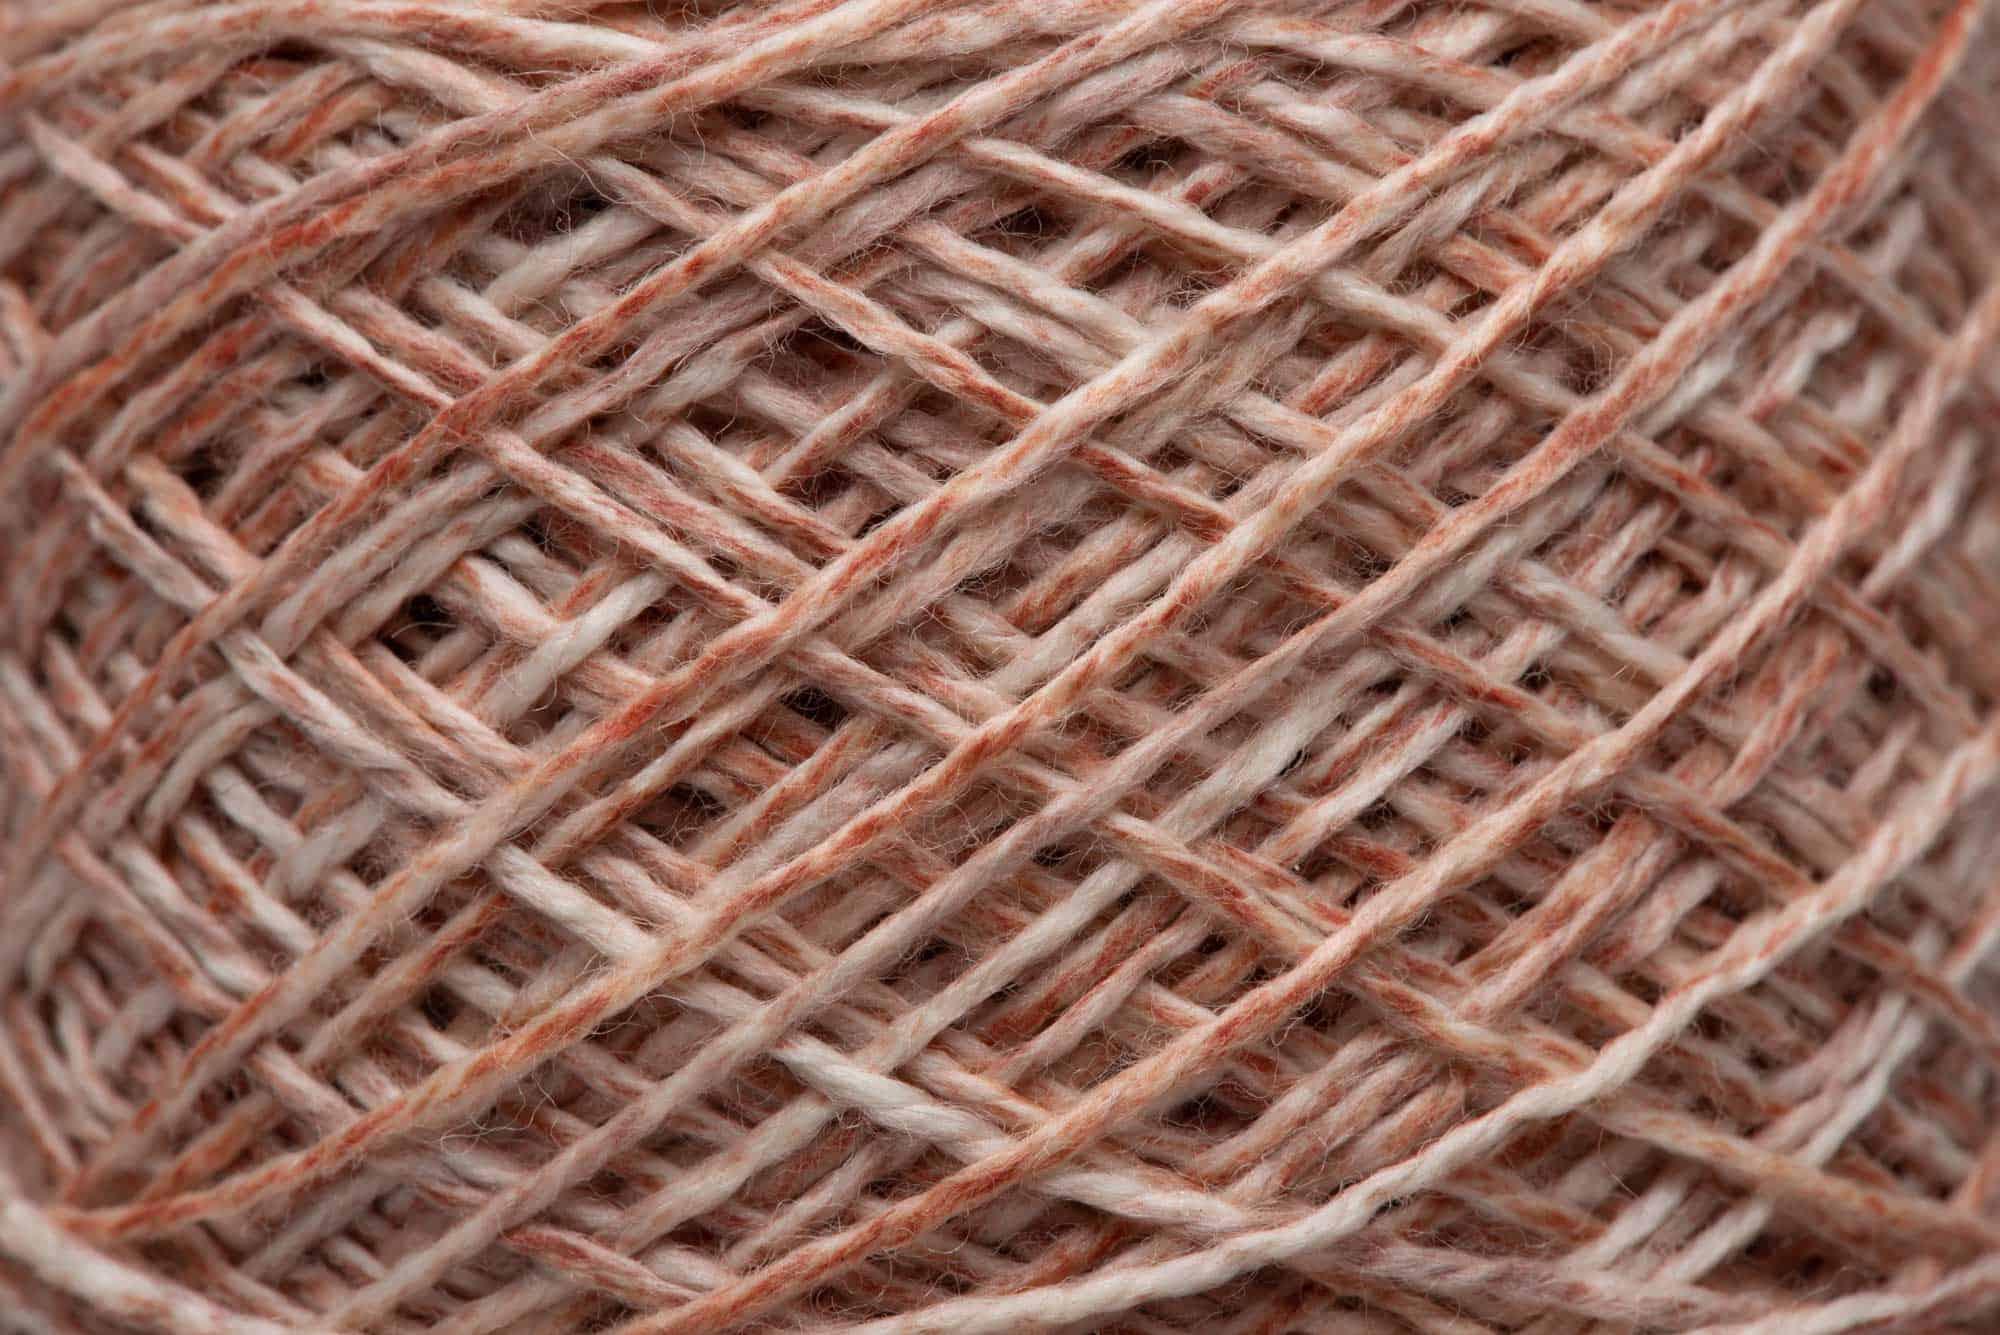 Copper Oxide-dyed 100% Merino Wool